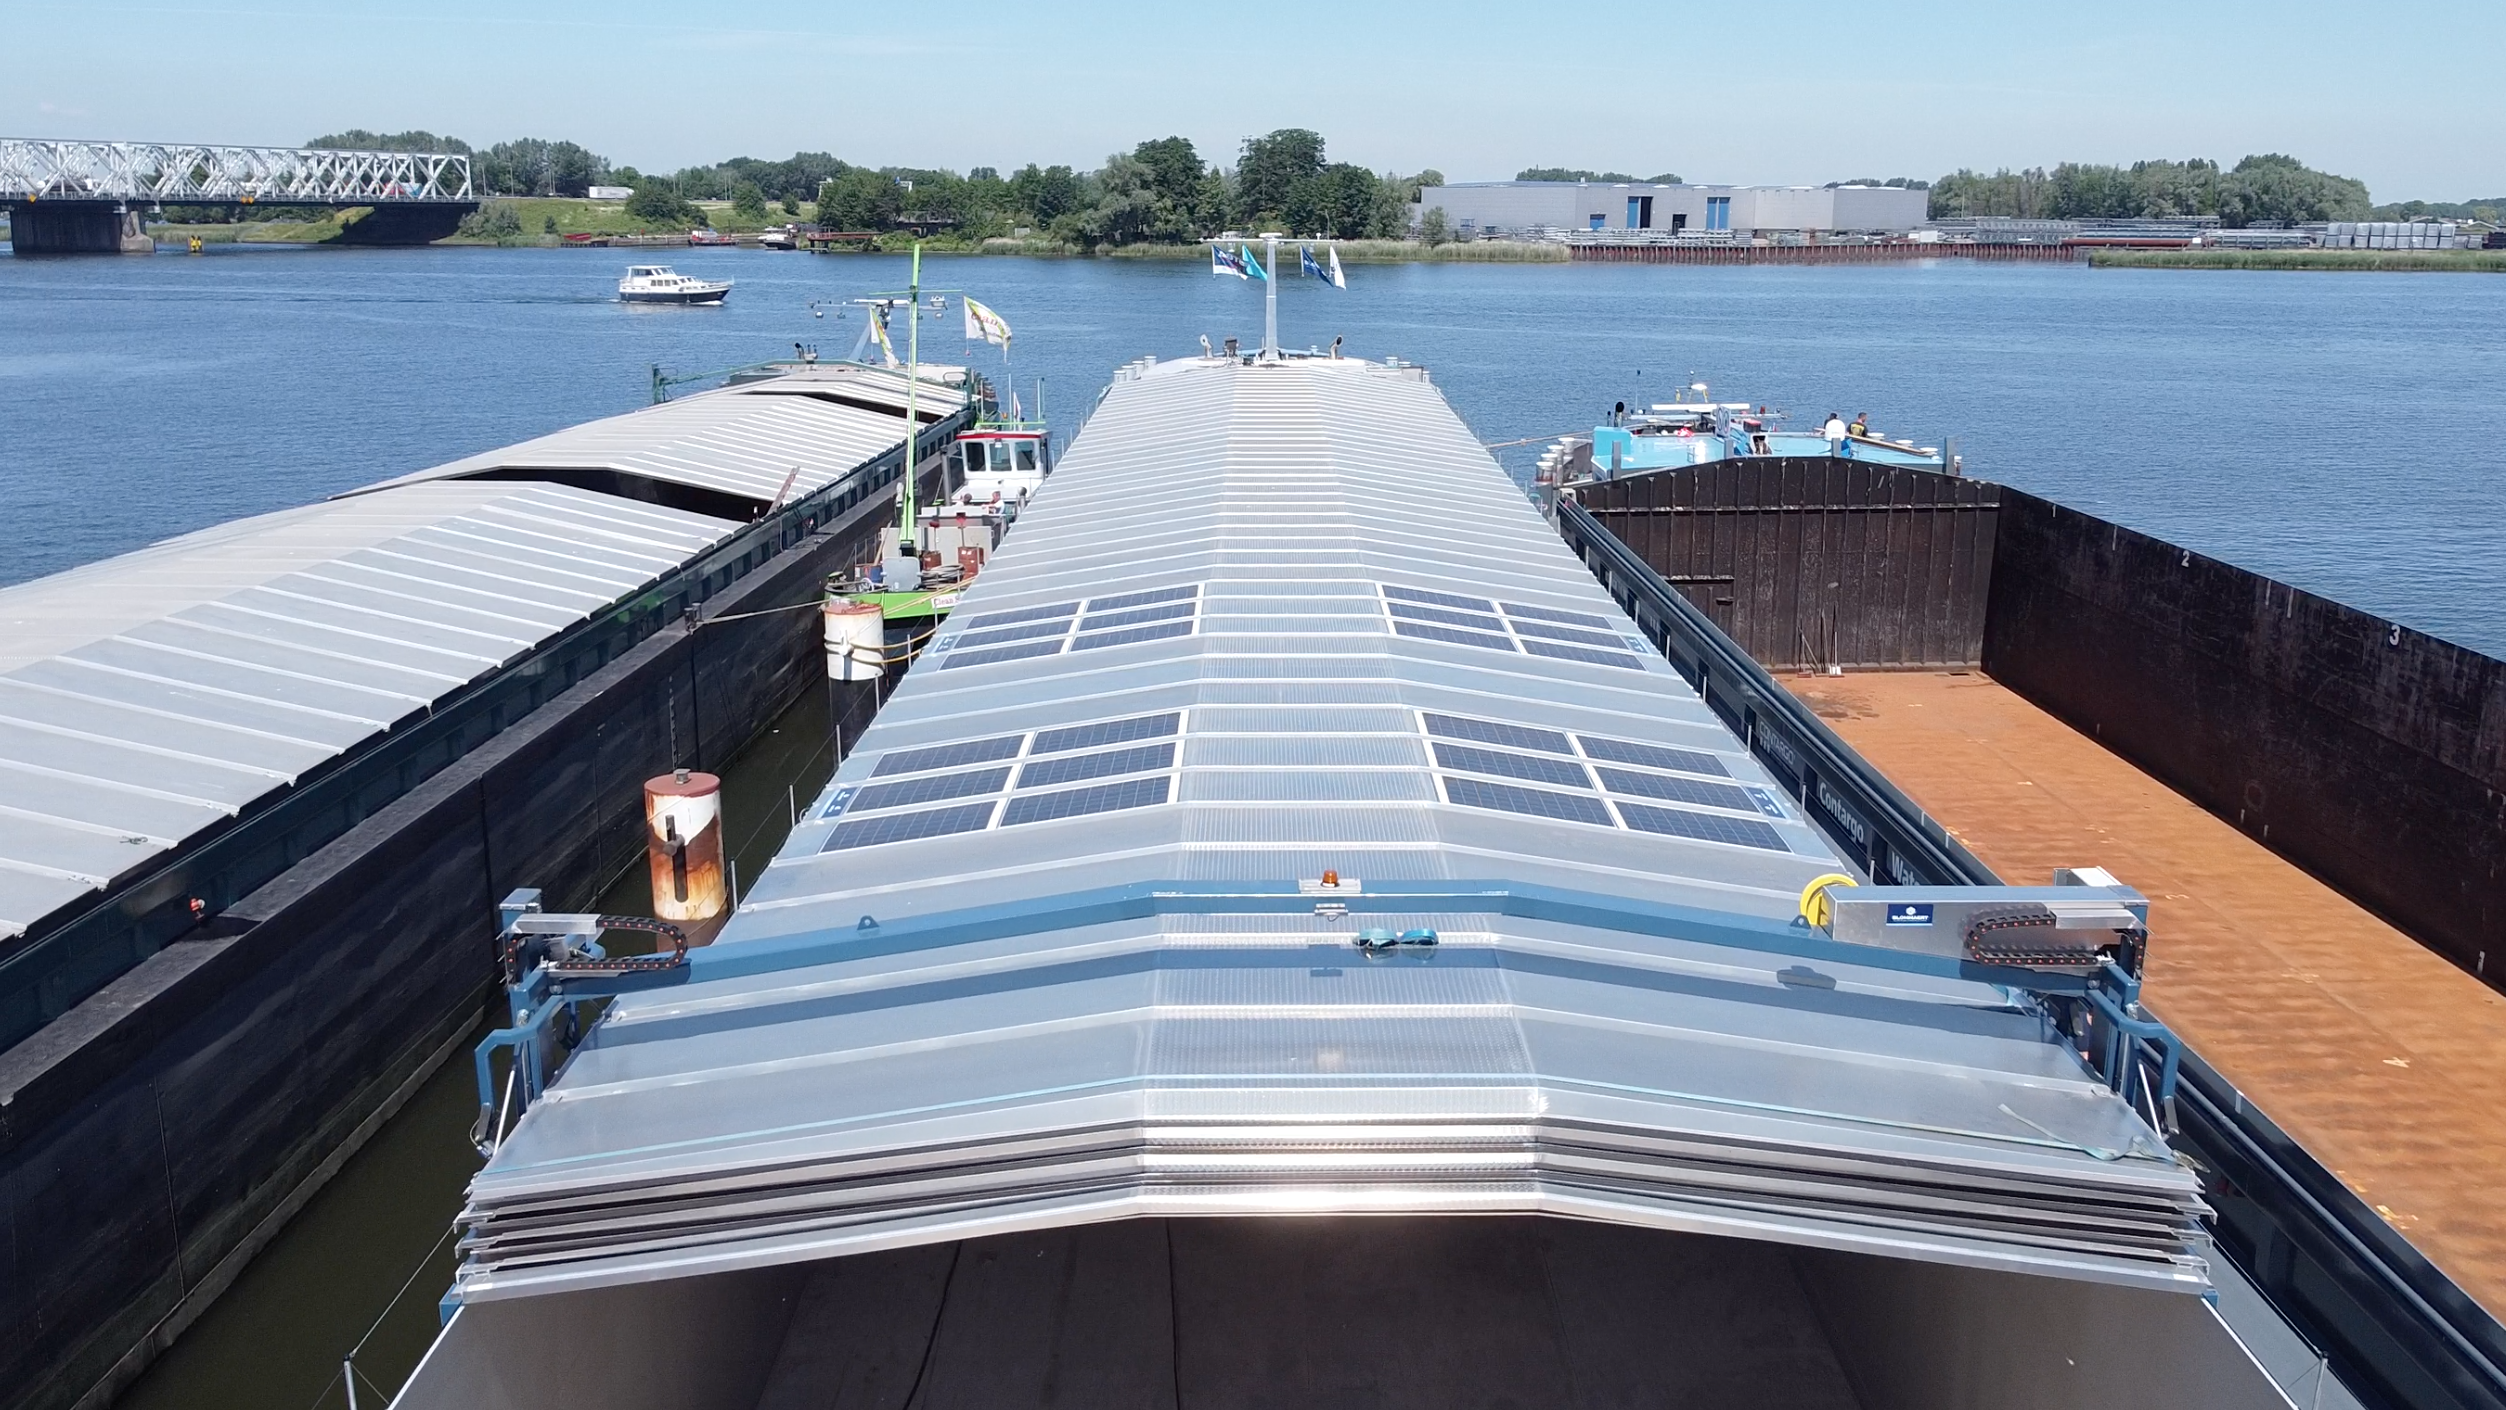 Wattlab - Birdeye view, zonnepanelen binnenvaartschip